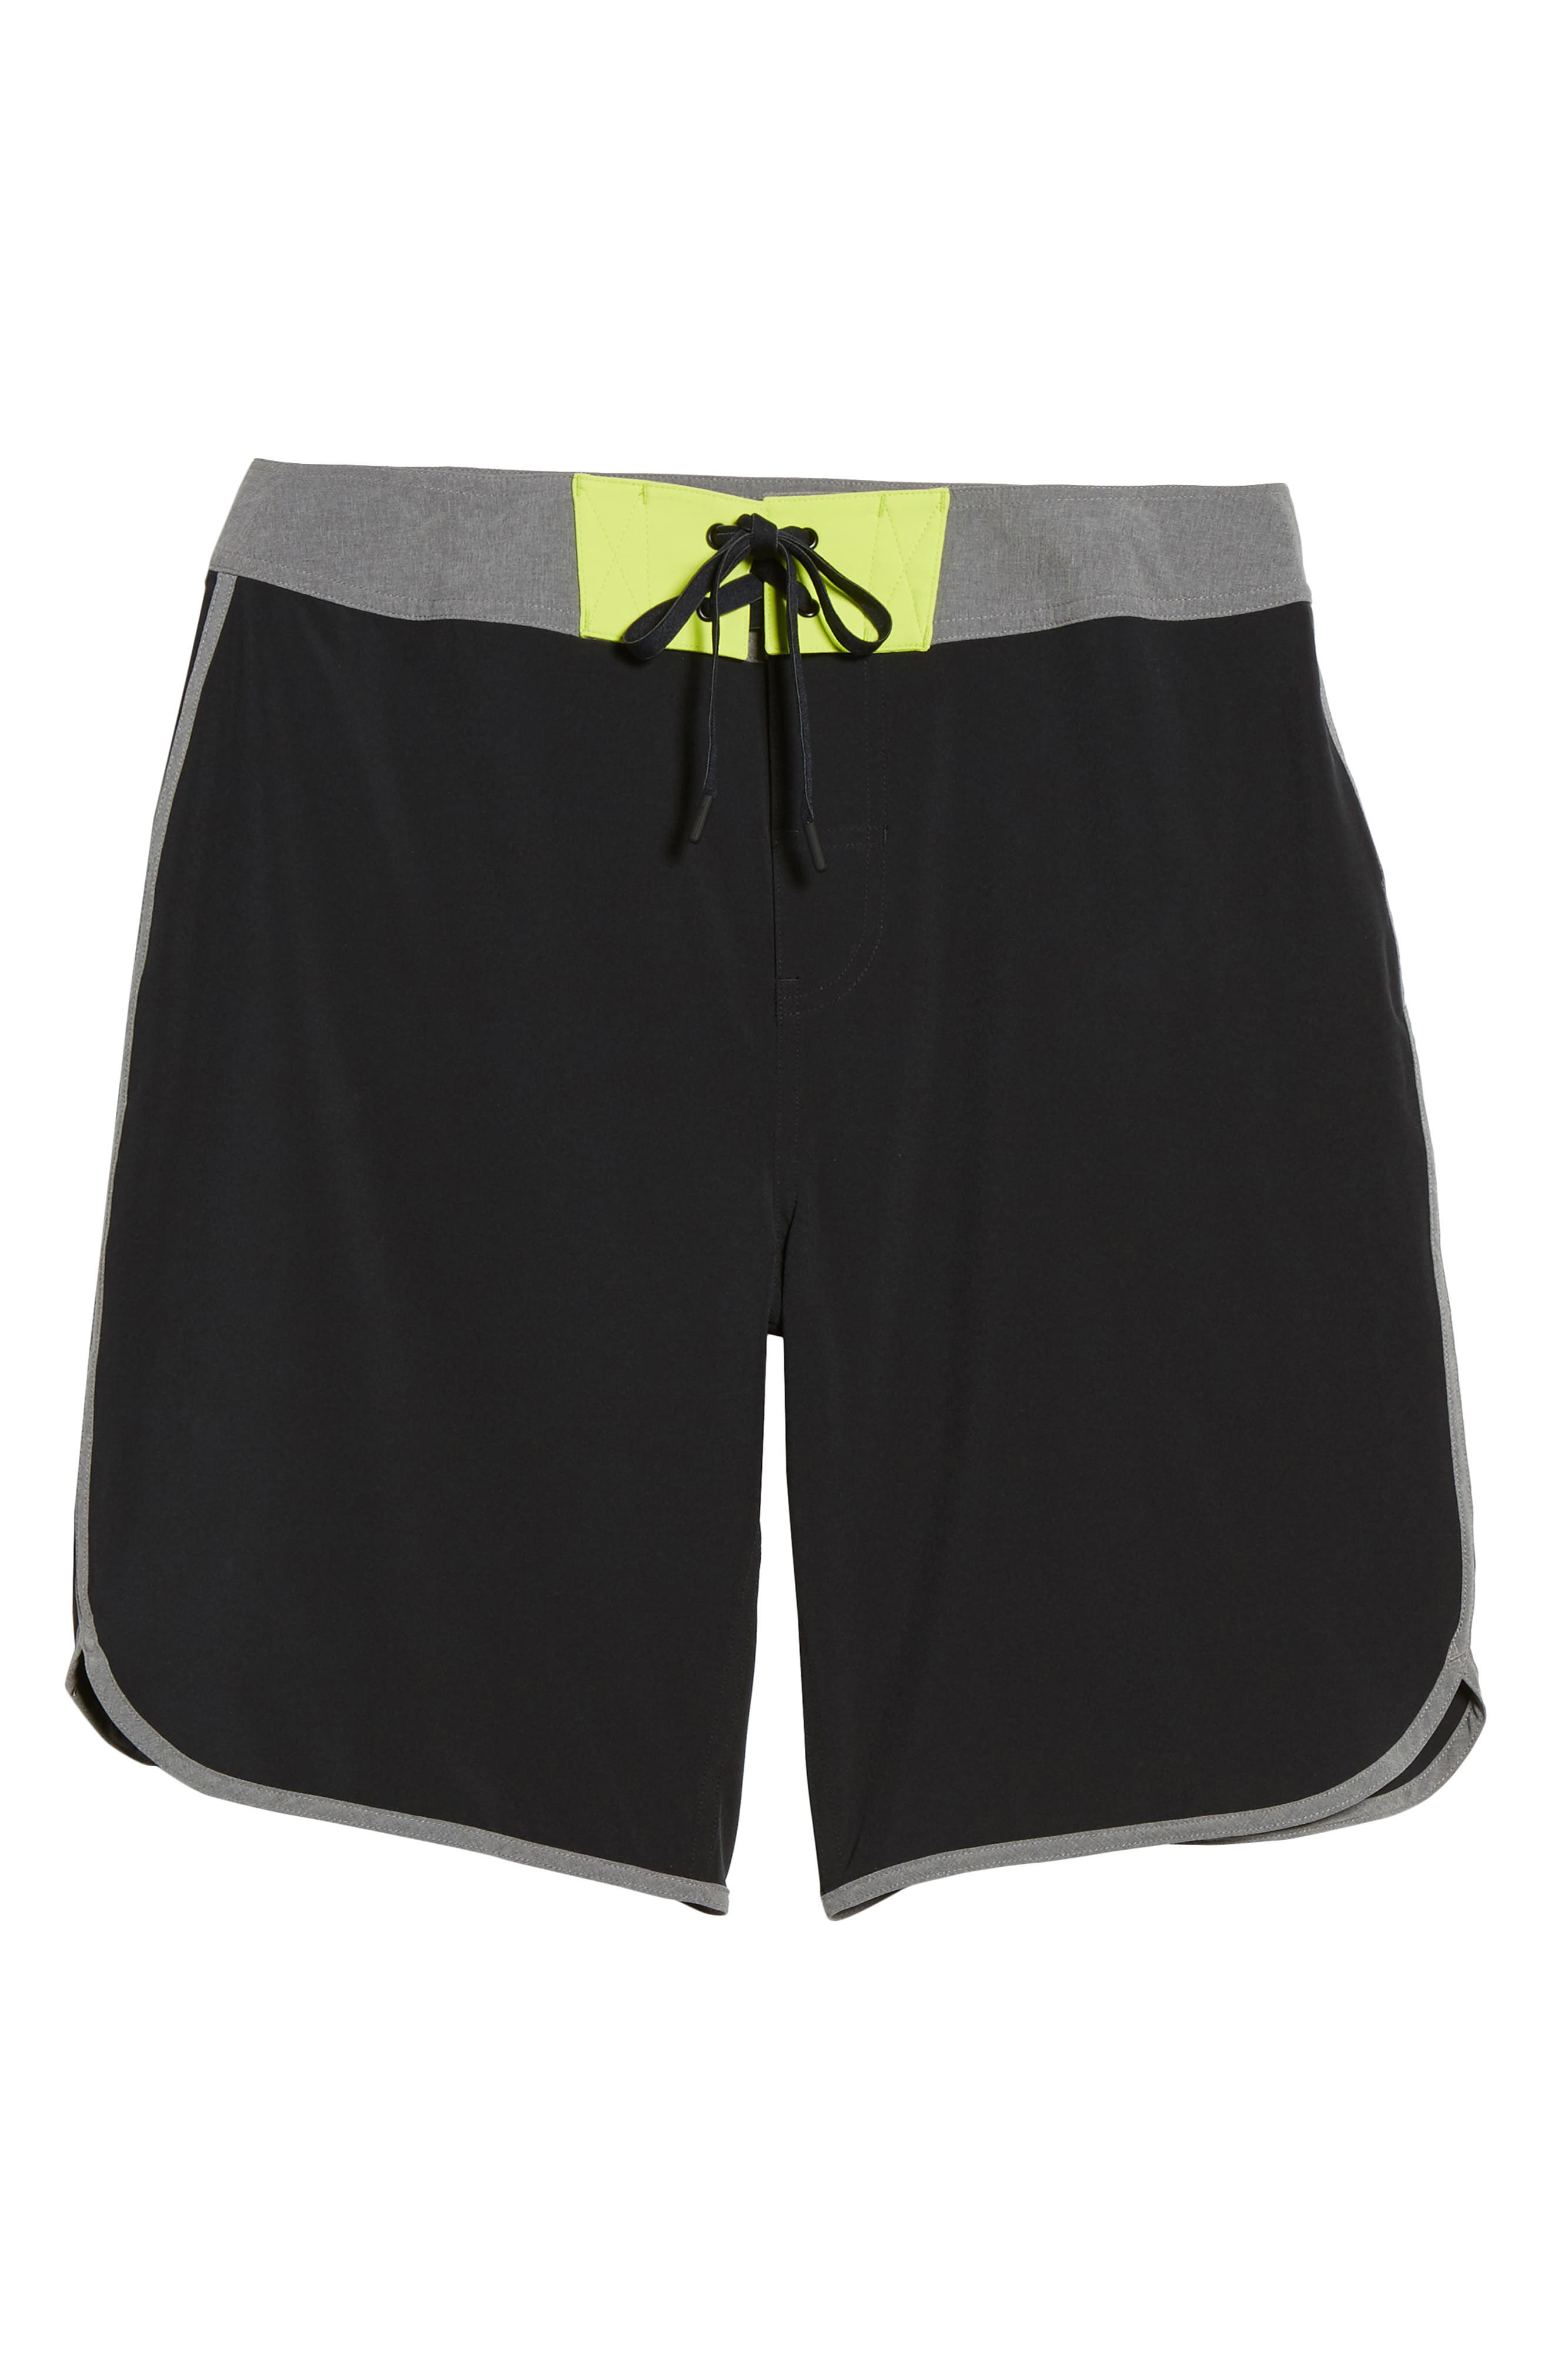 Flex Hybrid Athletic Shorts,                             Alternate thumbnail 6, color,                             001